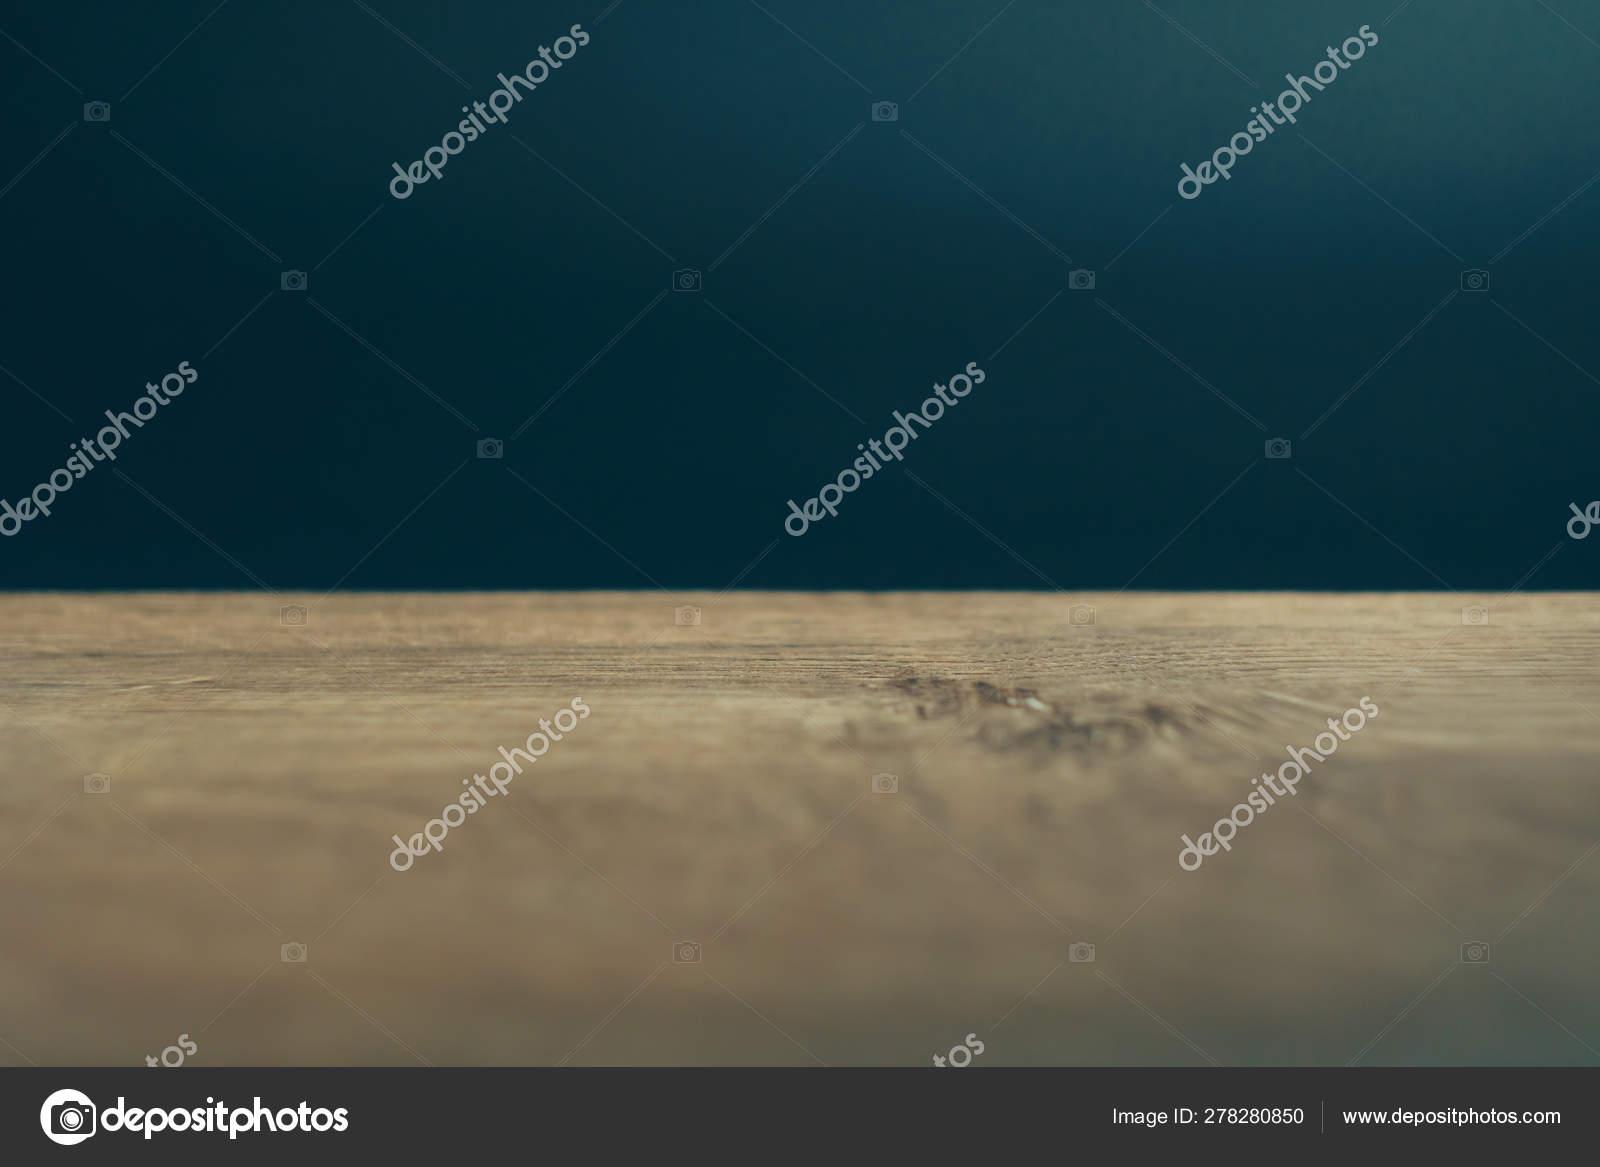 Dark Background On Top And Light Background On Bottom Stock Photo C Shevarevalex 278280850